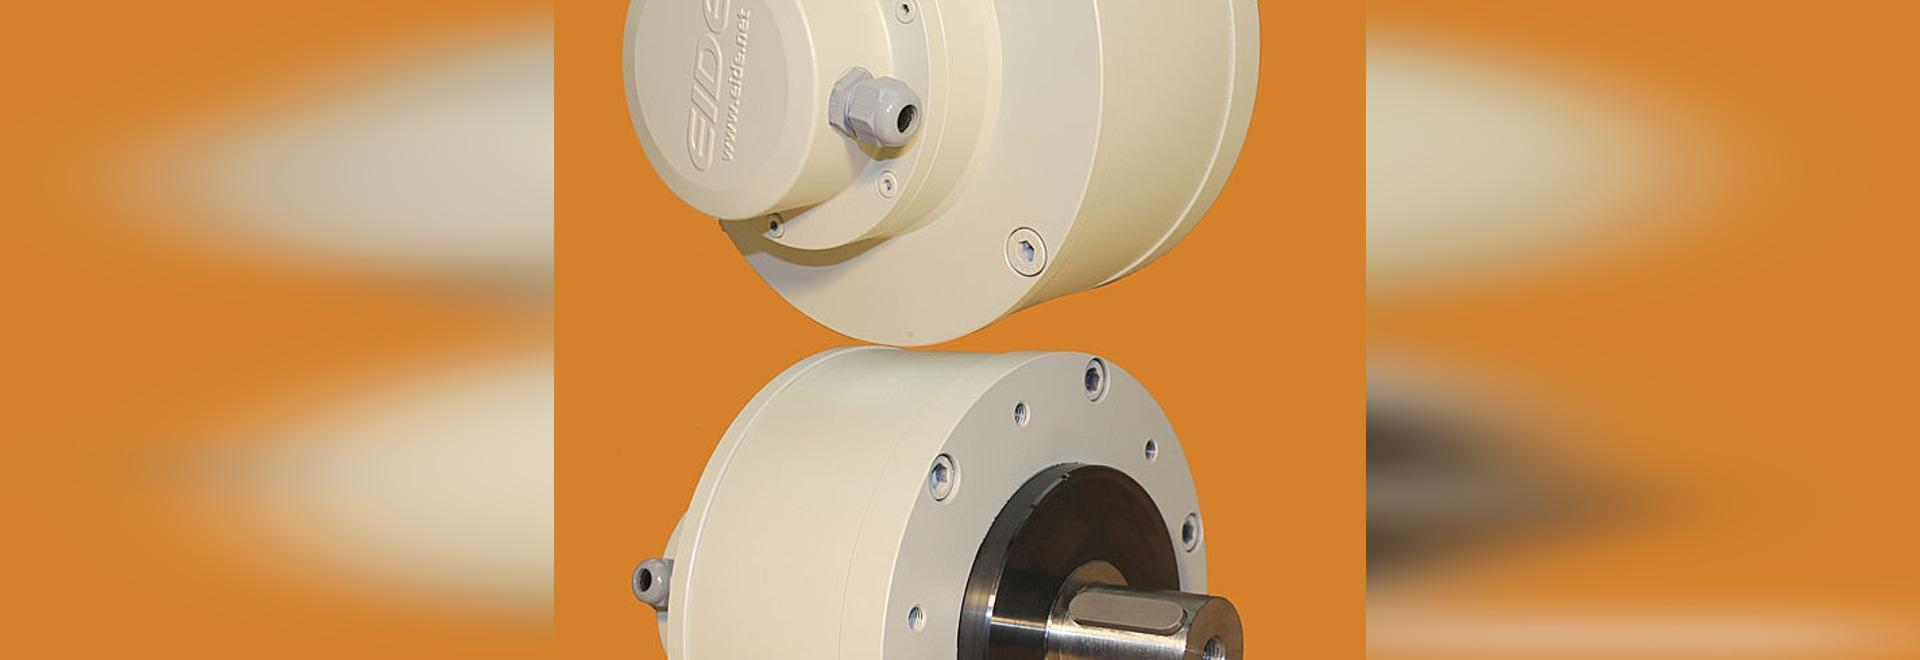 OVERSPEED SAFETY BRAKE  FPC-6000